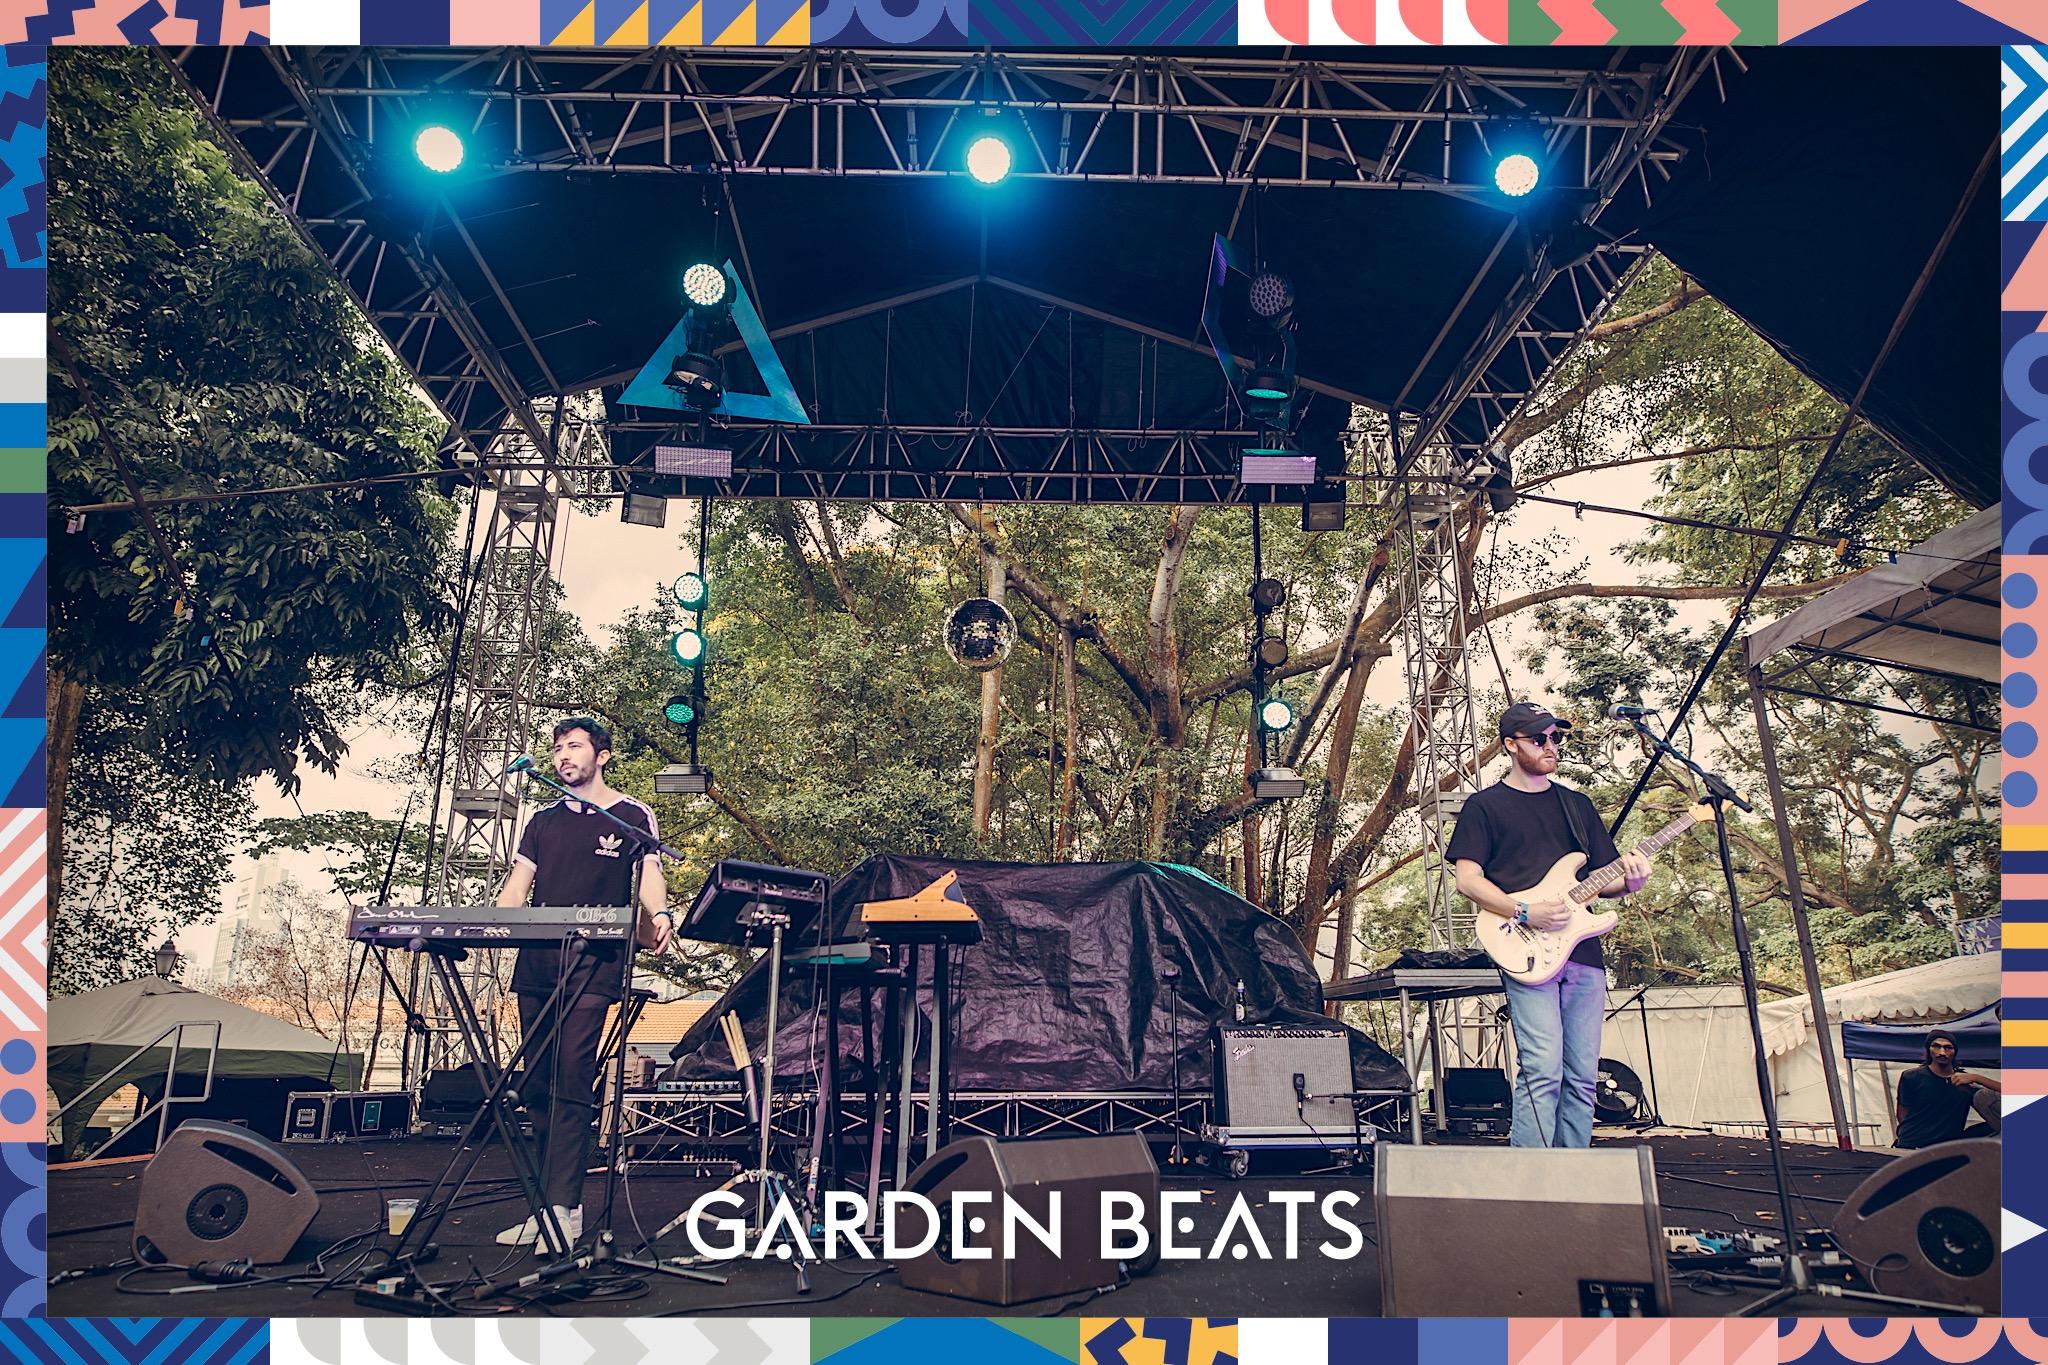 03032018_GardenBeats_Colossal520_Watermarked.jpg